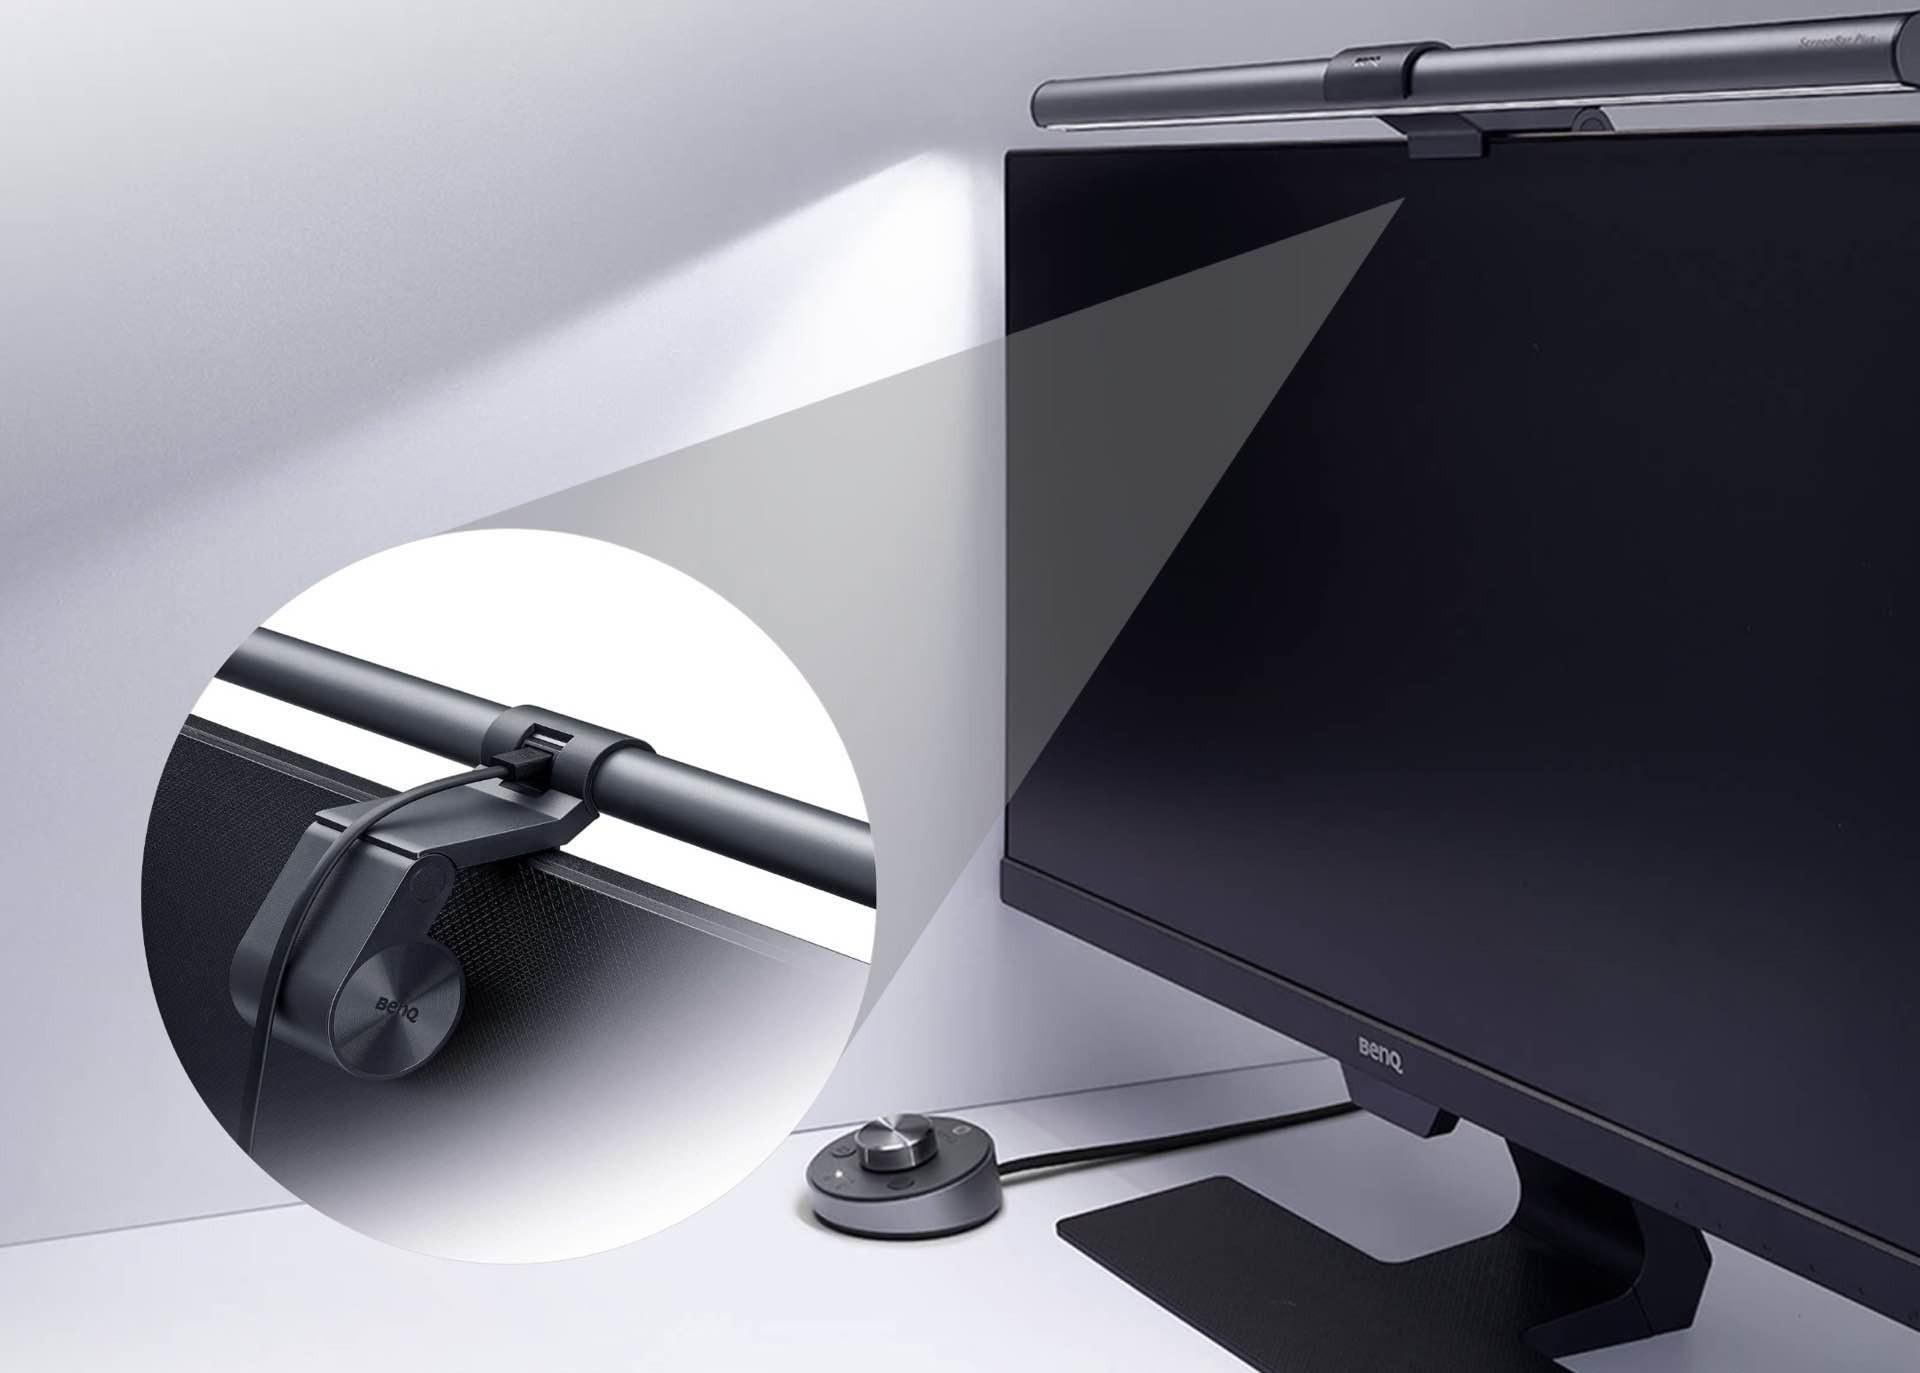 benq-screenbar-plus-monitor-lamp-with-desktop-control-dial-installation